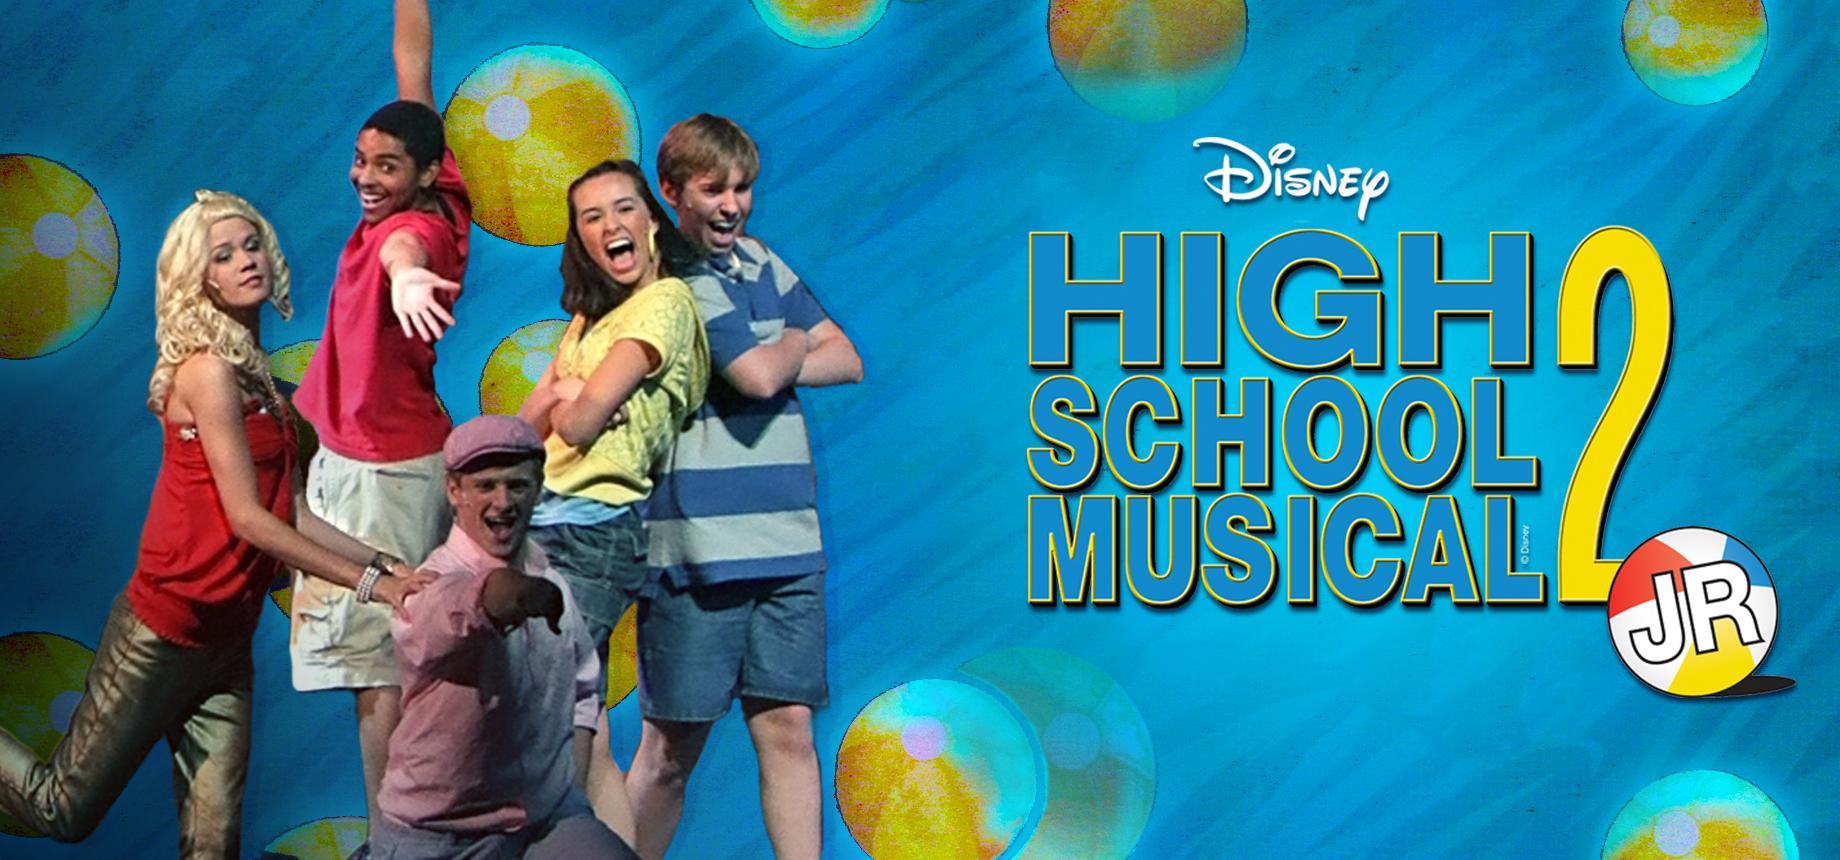 Disney S High School Musical 2 Jr